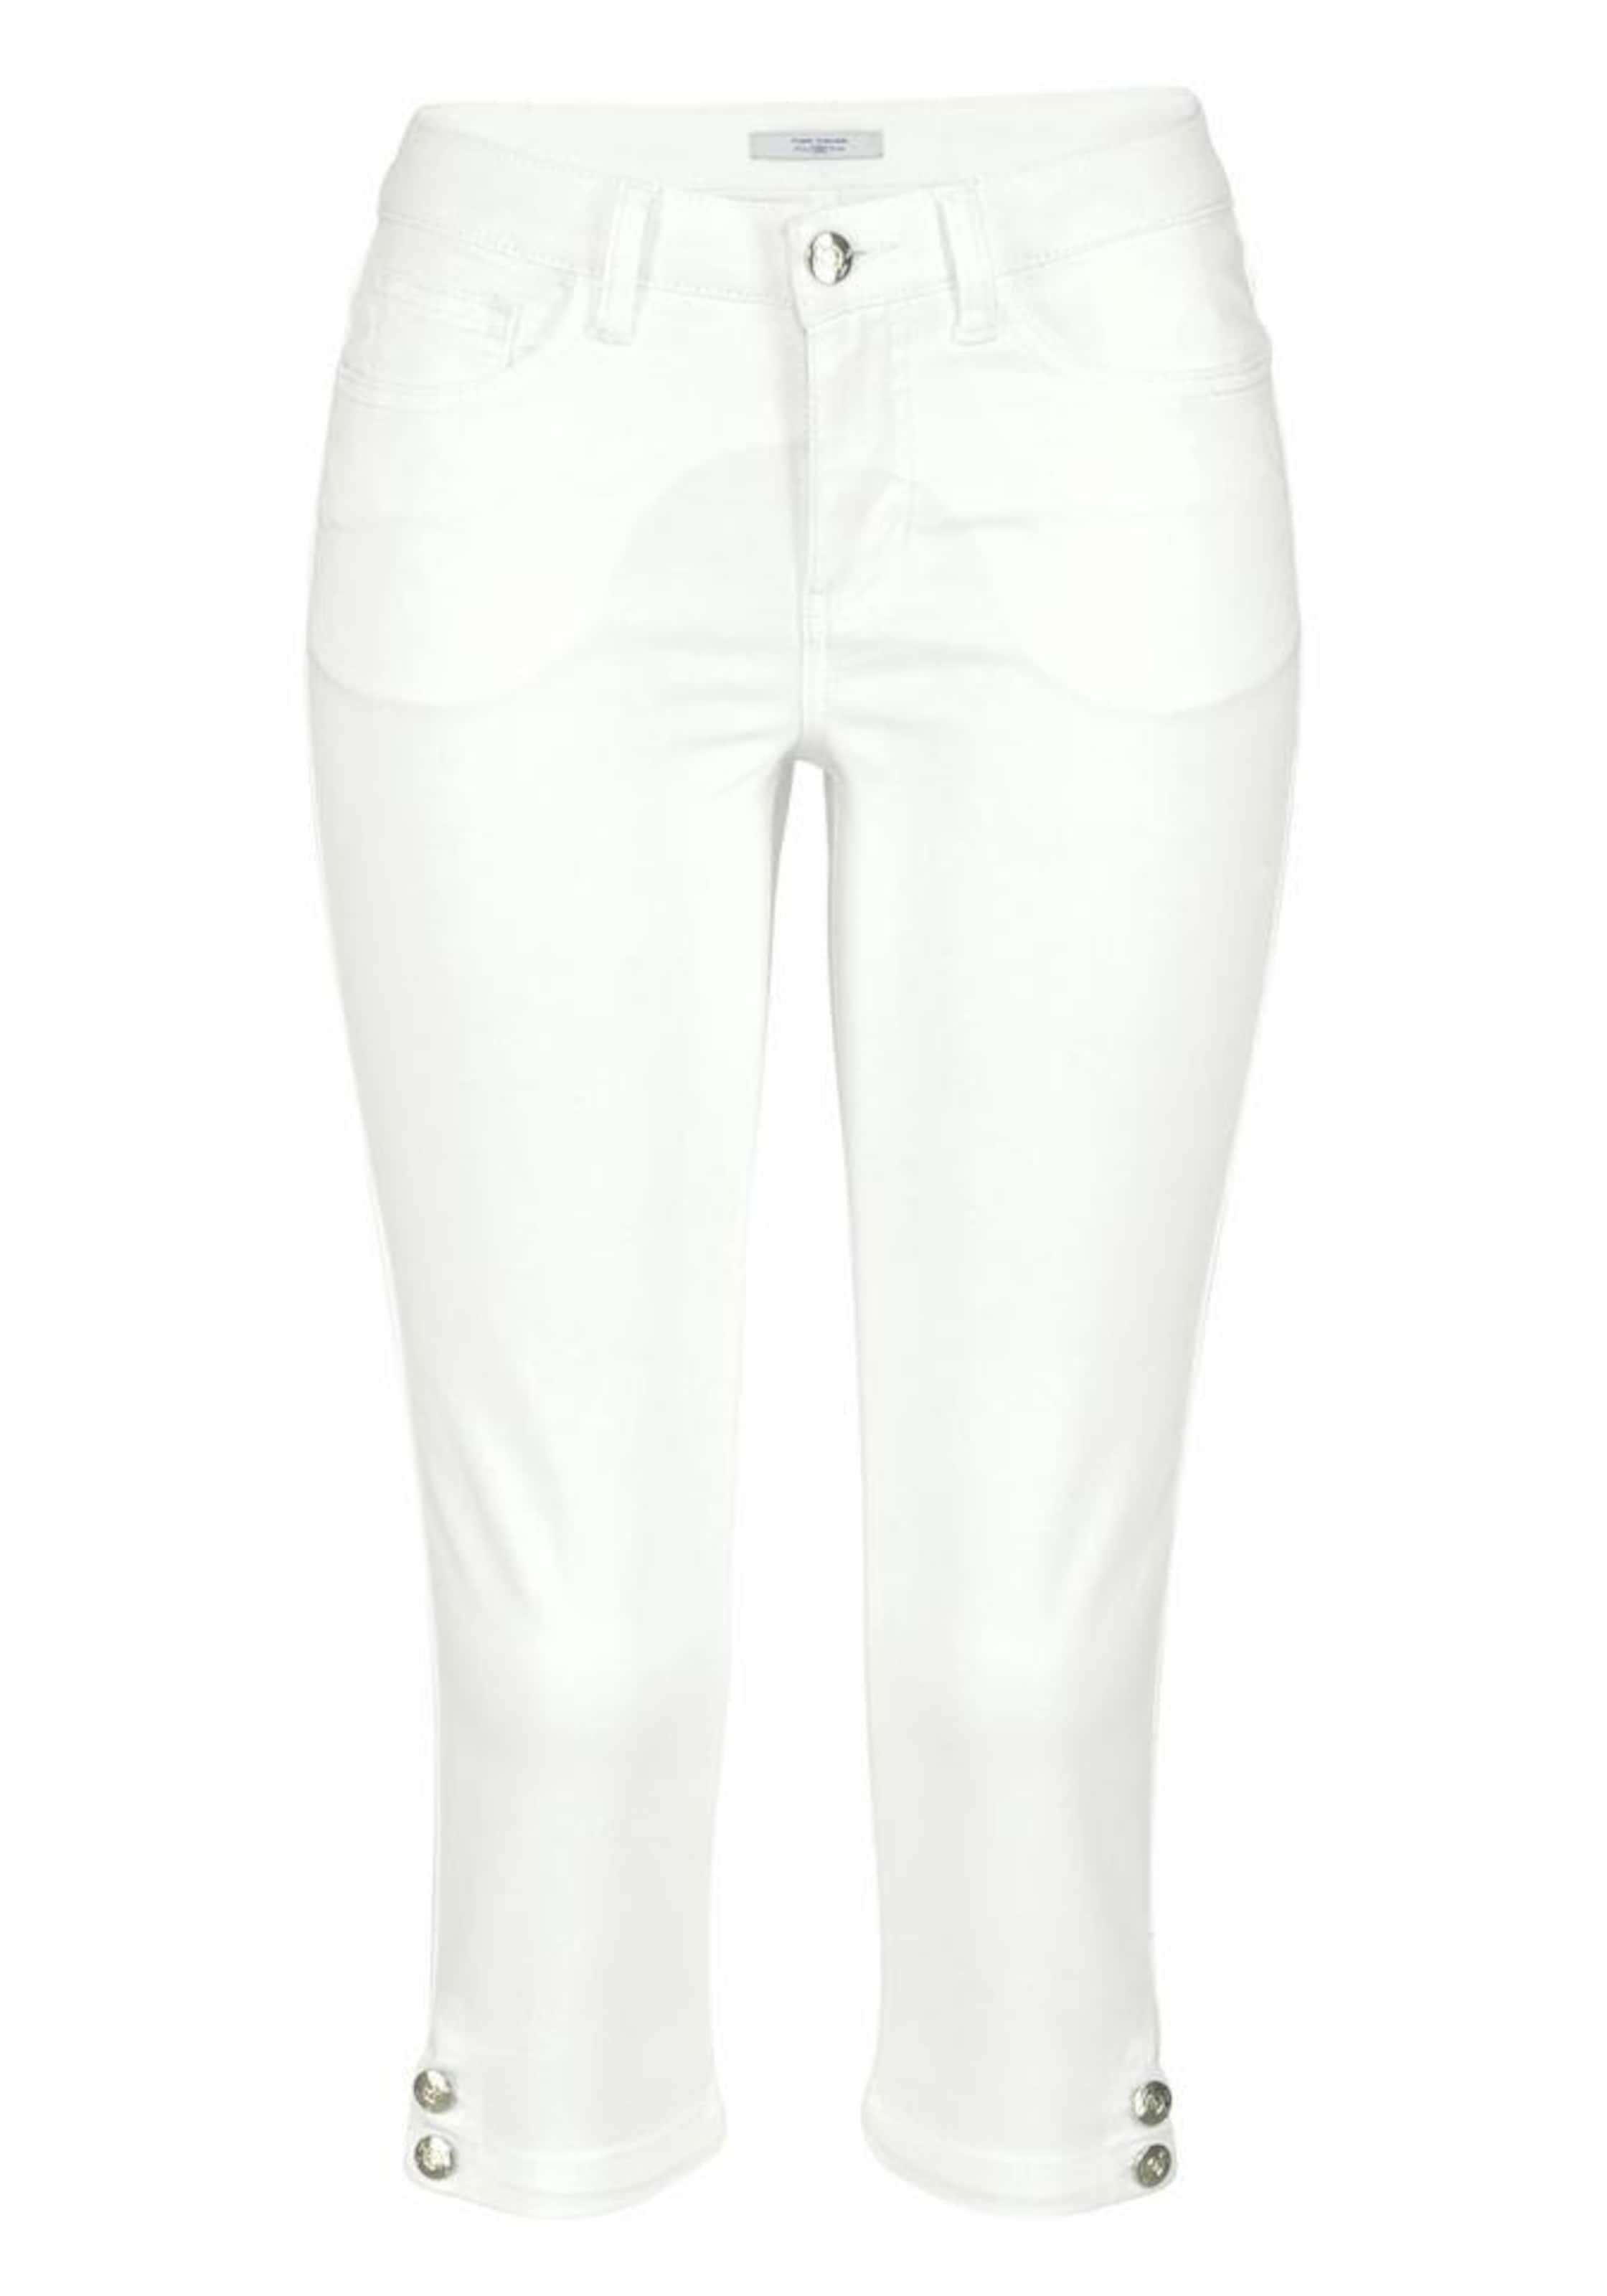 Polo Tailor Caprihose Weiß In Tom Team OTwikPZXu